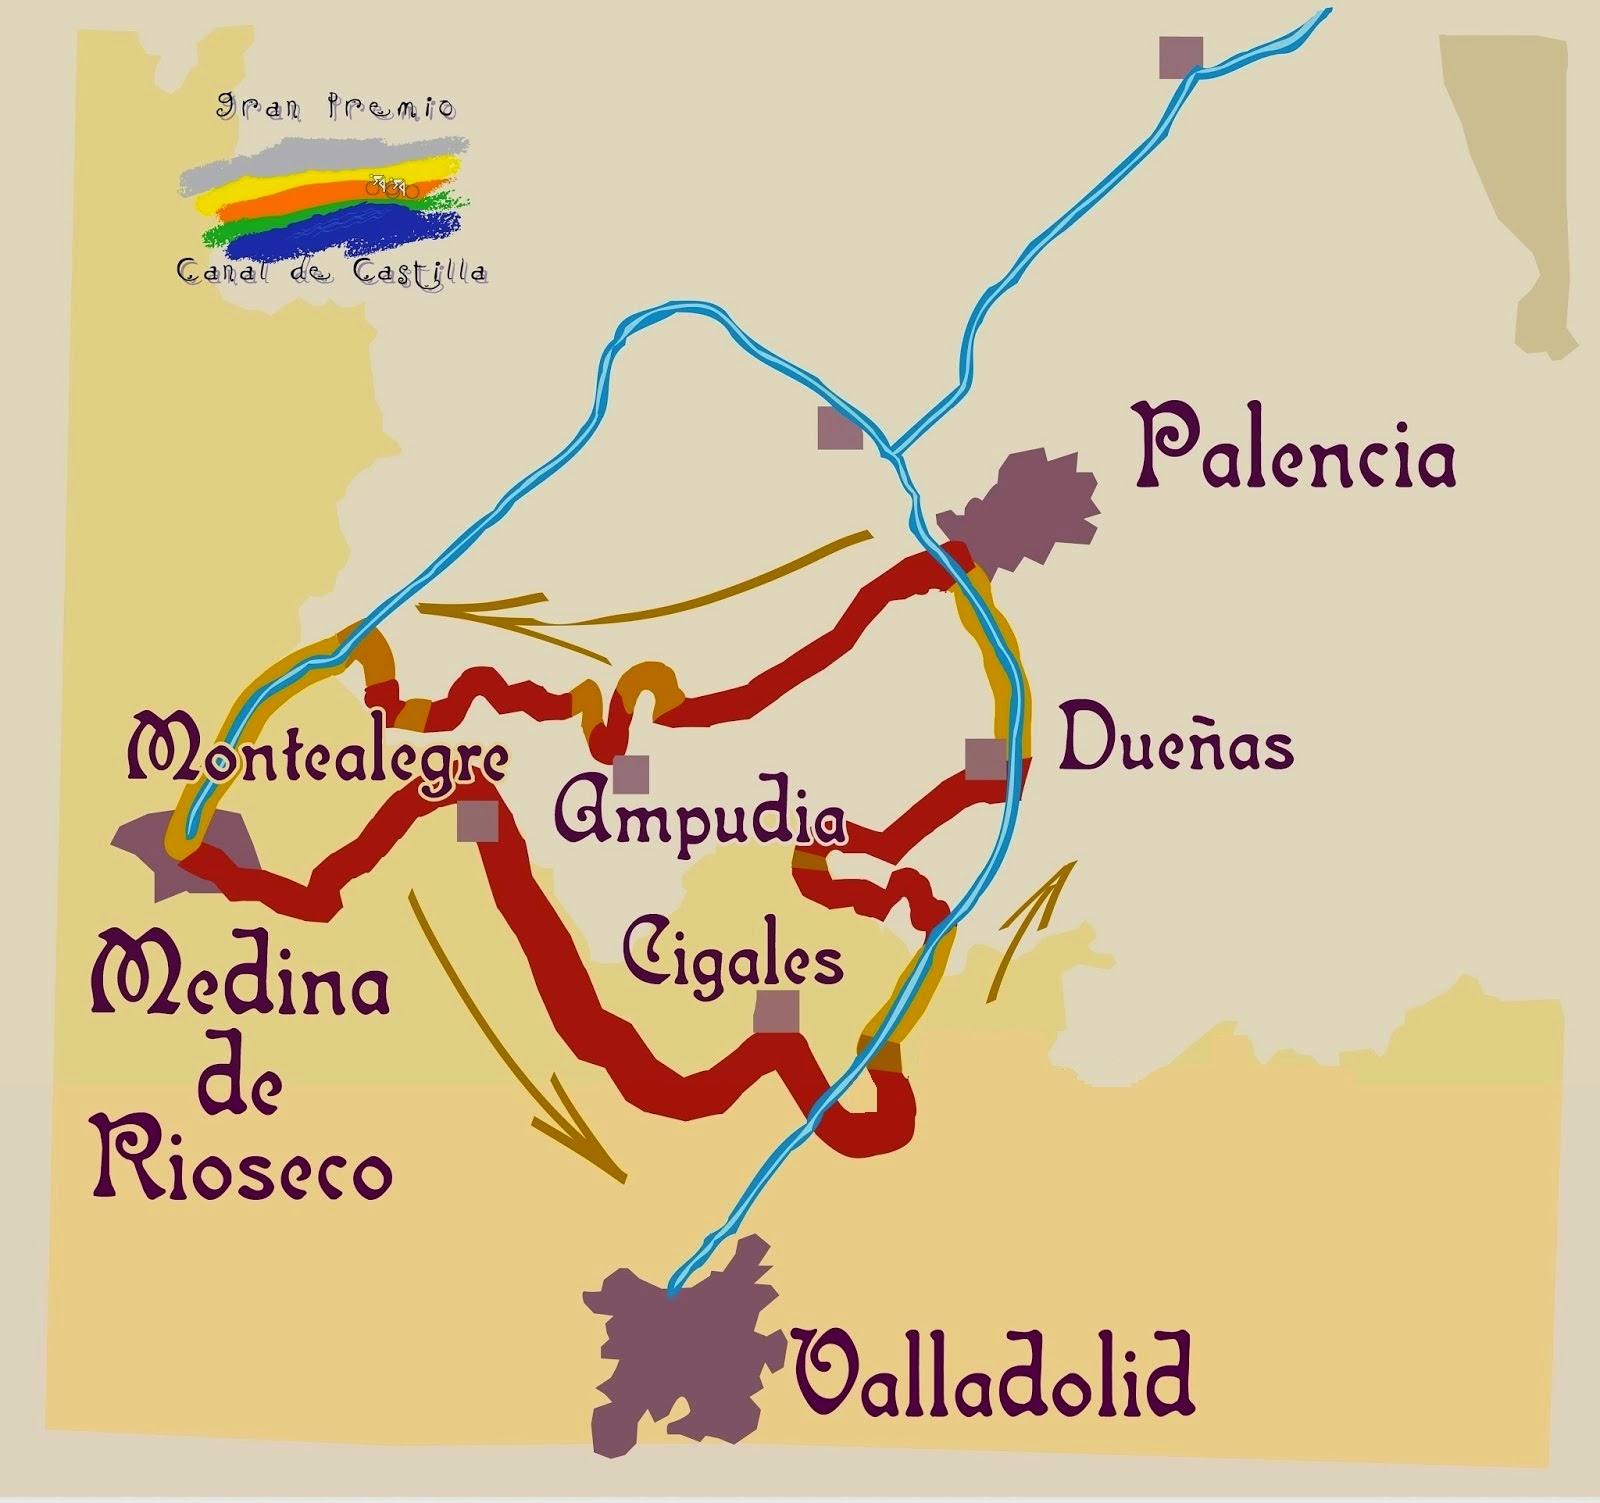 Sportive GP Canal de Castilla